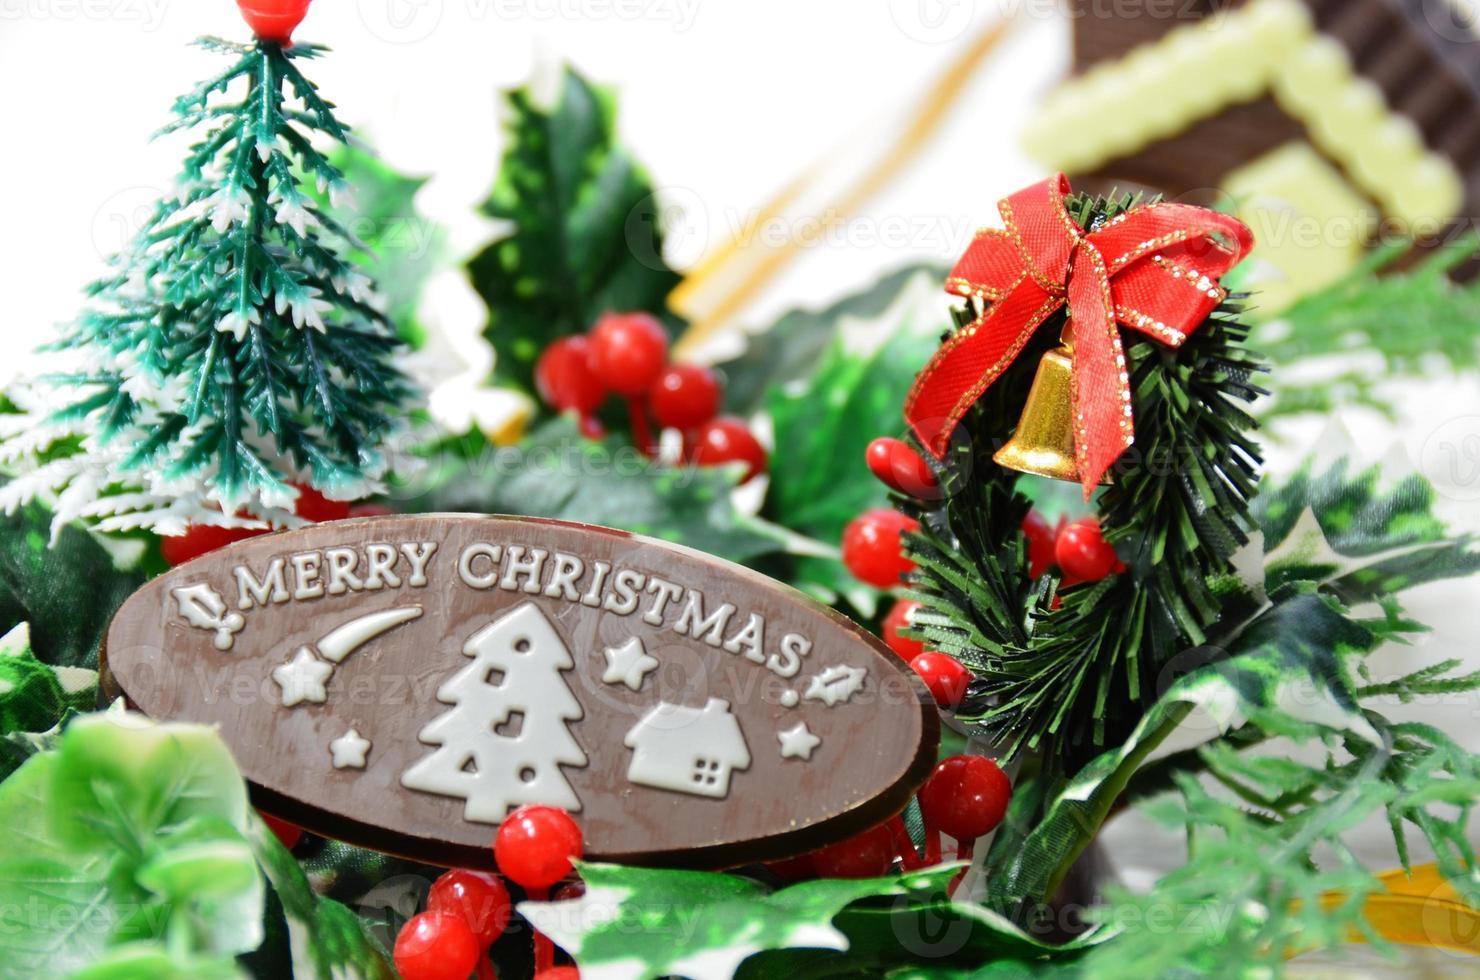 kerst ornament op witte achtergrond foto